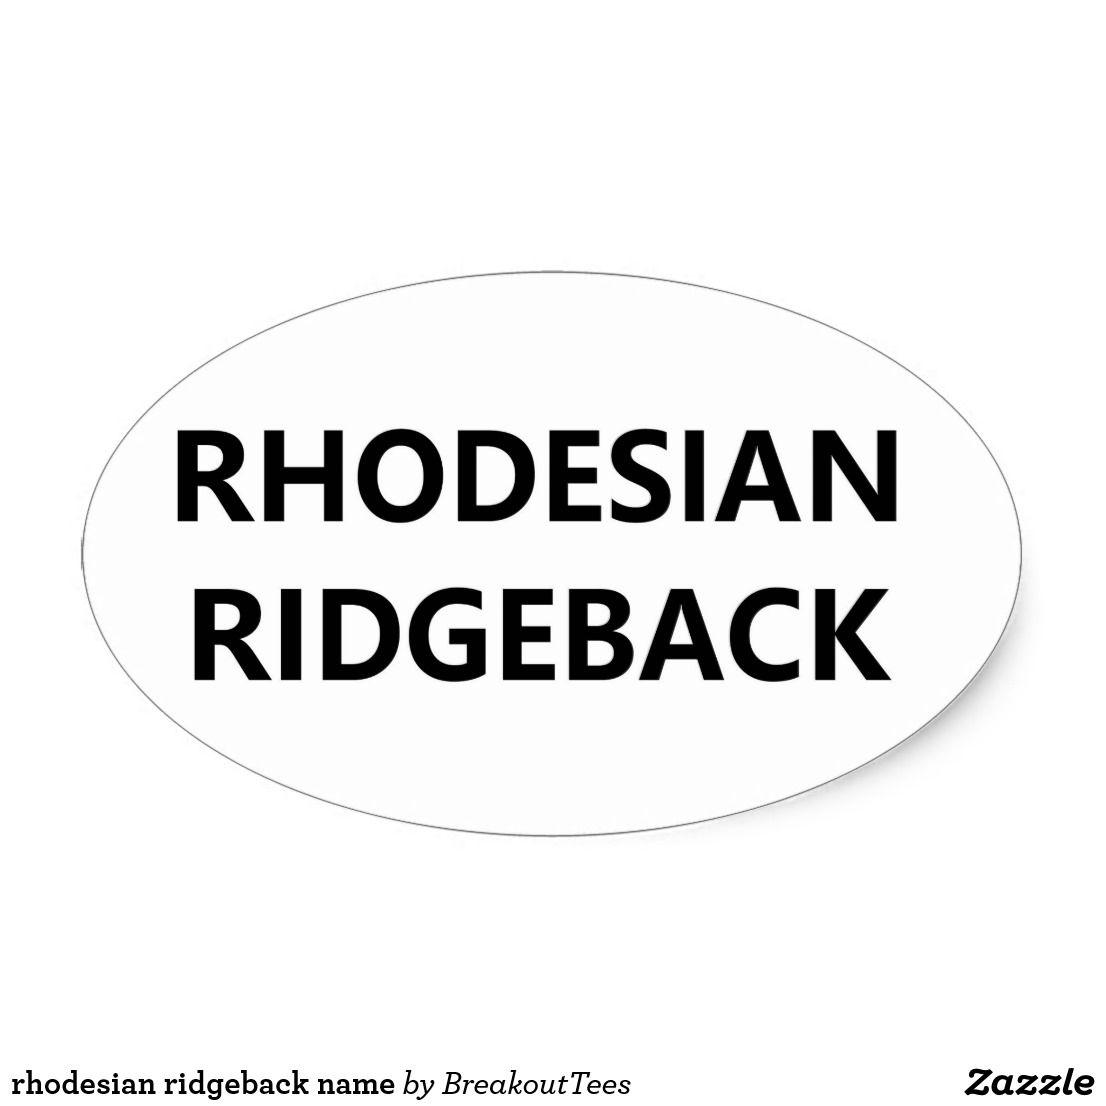 Rhodesian Ridgeback Name Oval Sticker